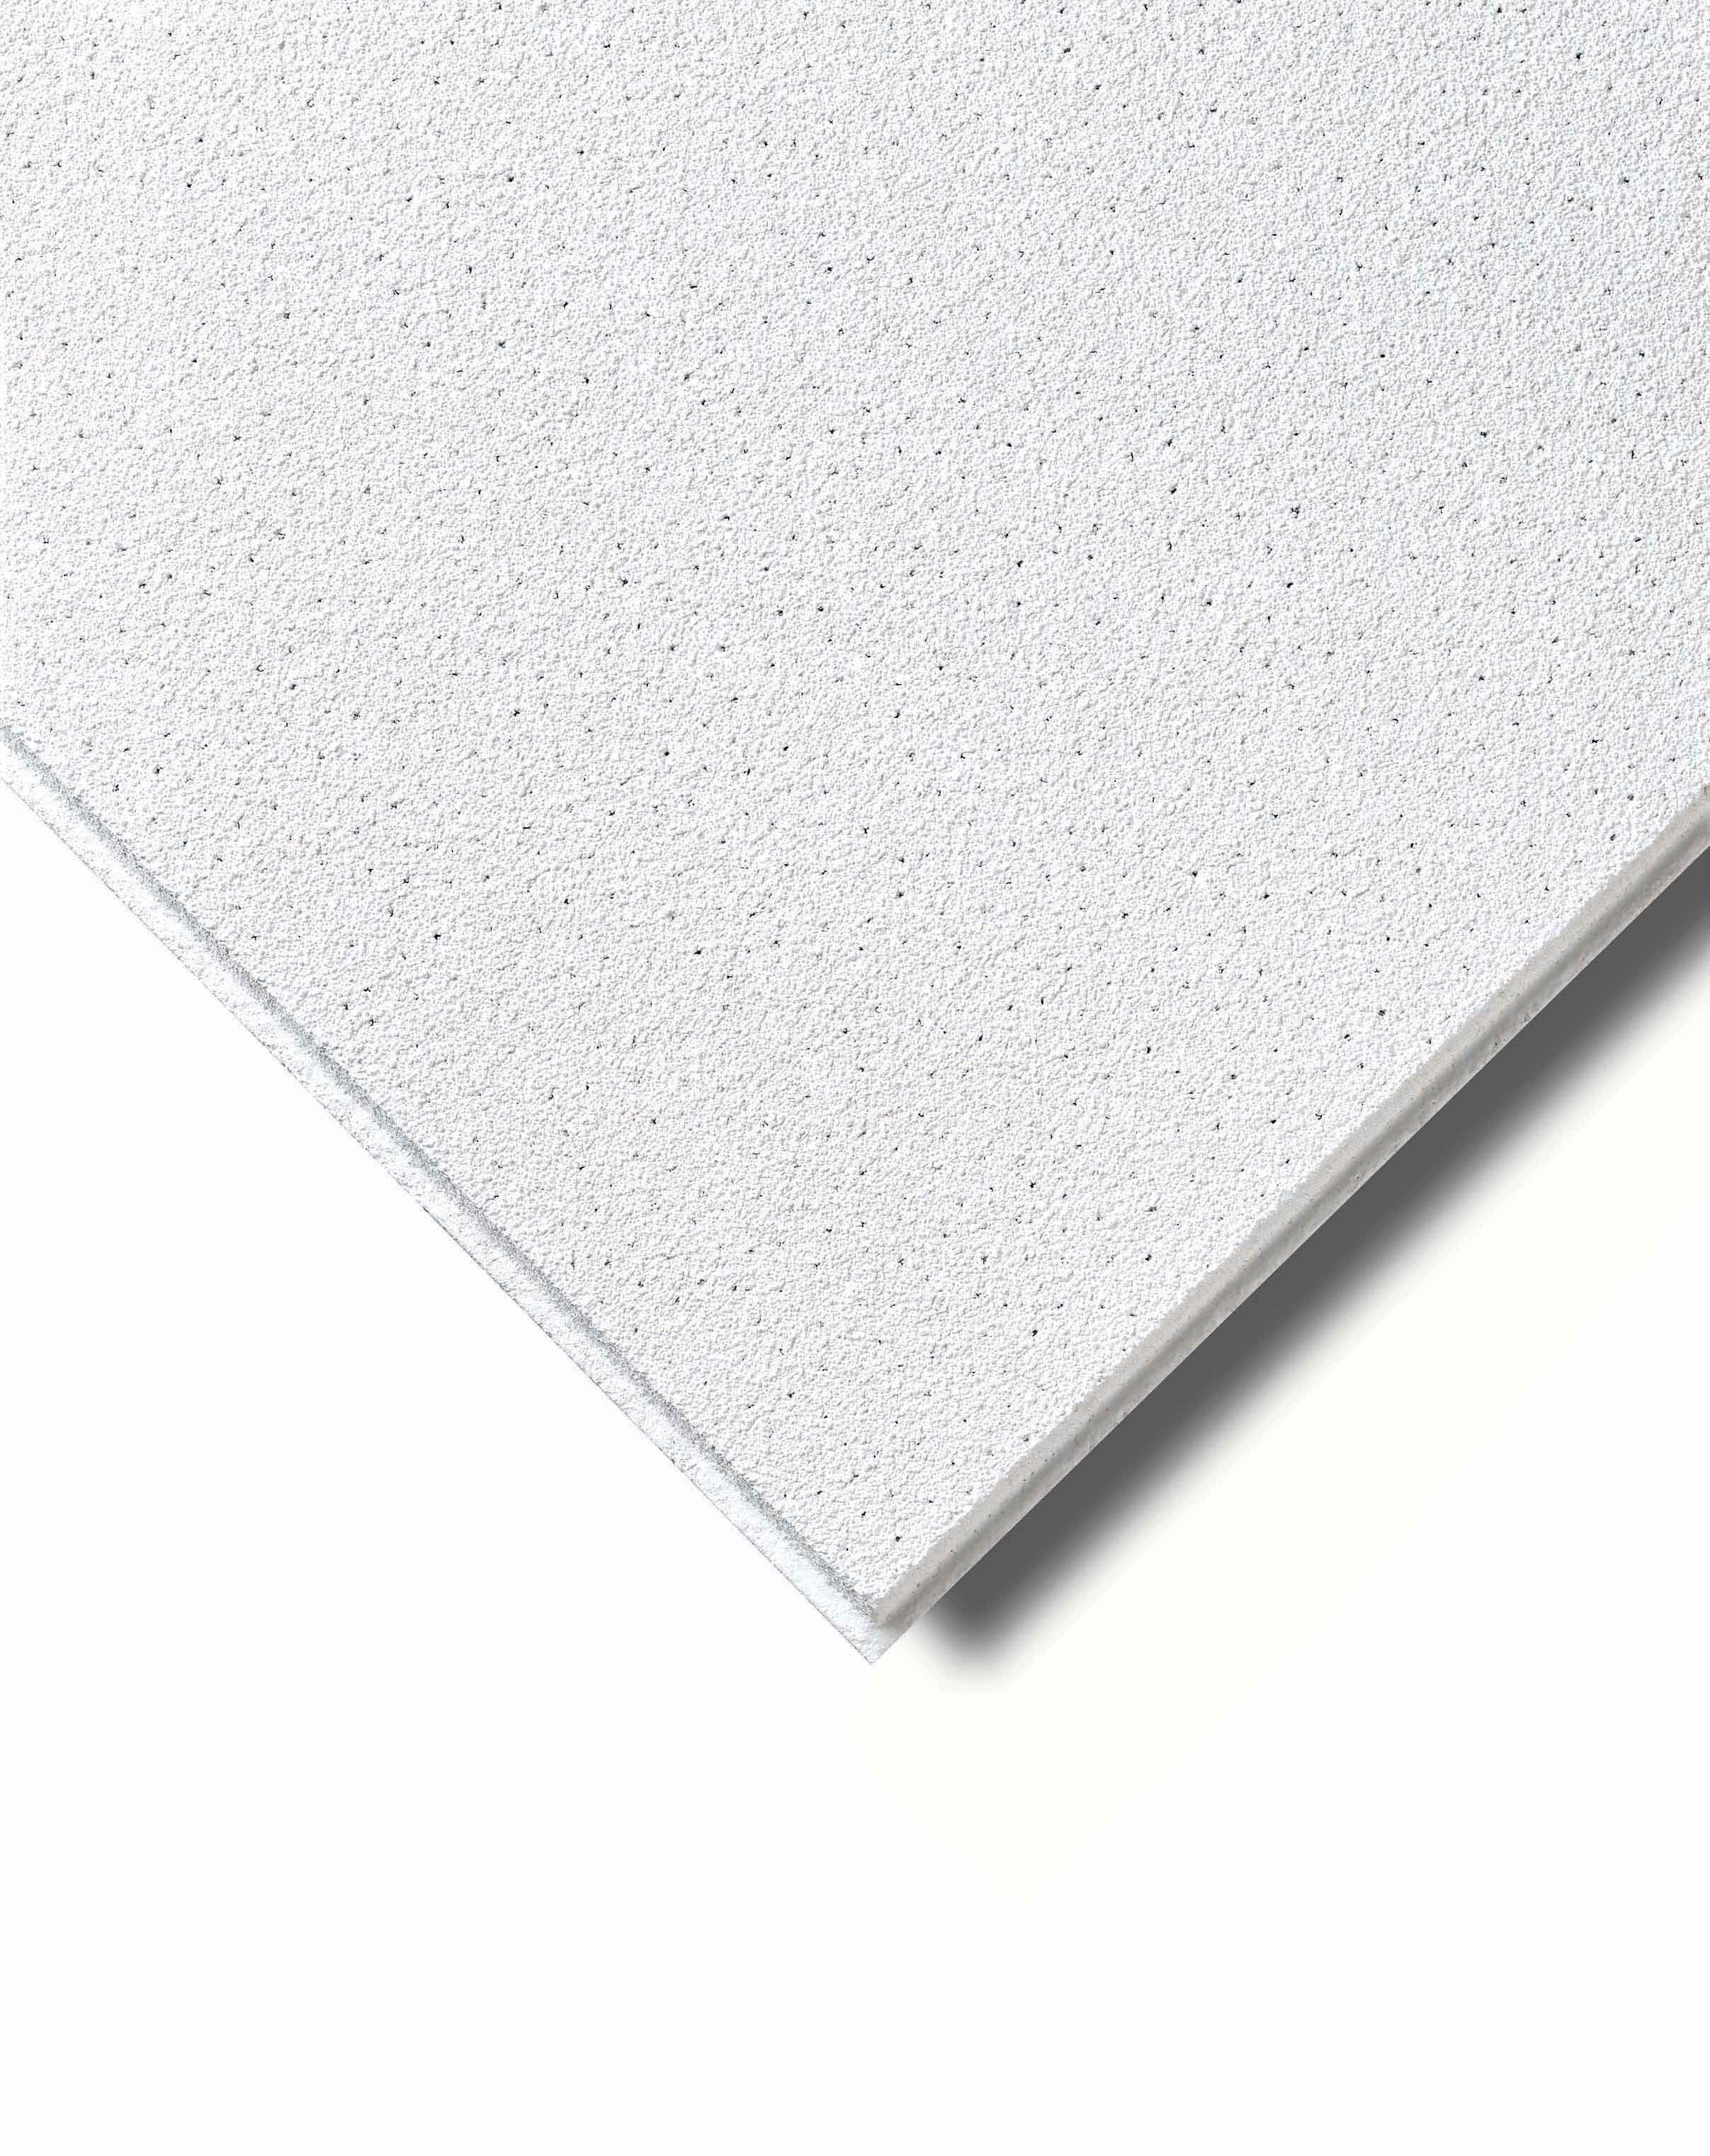 Armstrong Dune Ceiling Tiles Data Sheet Http